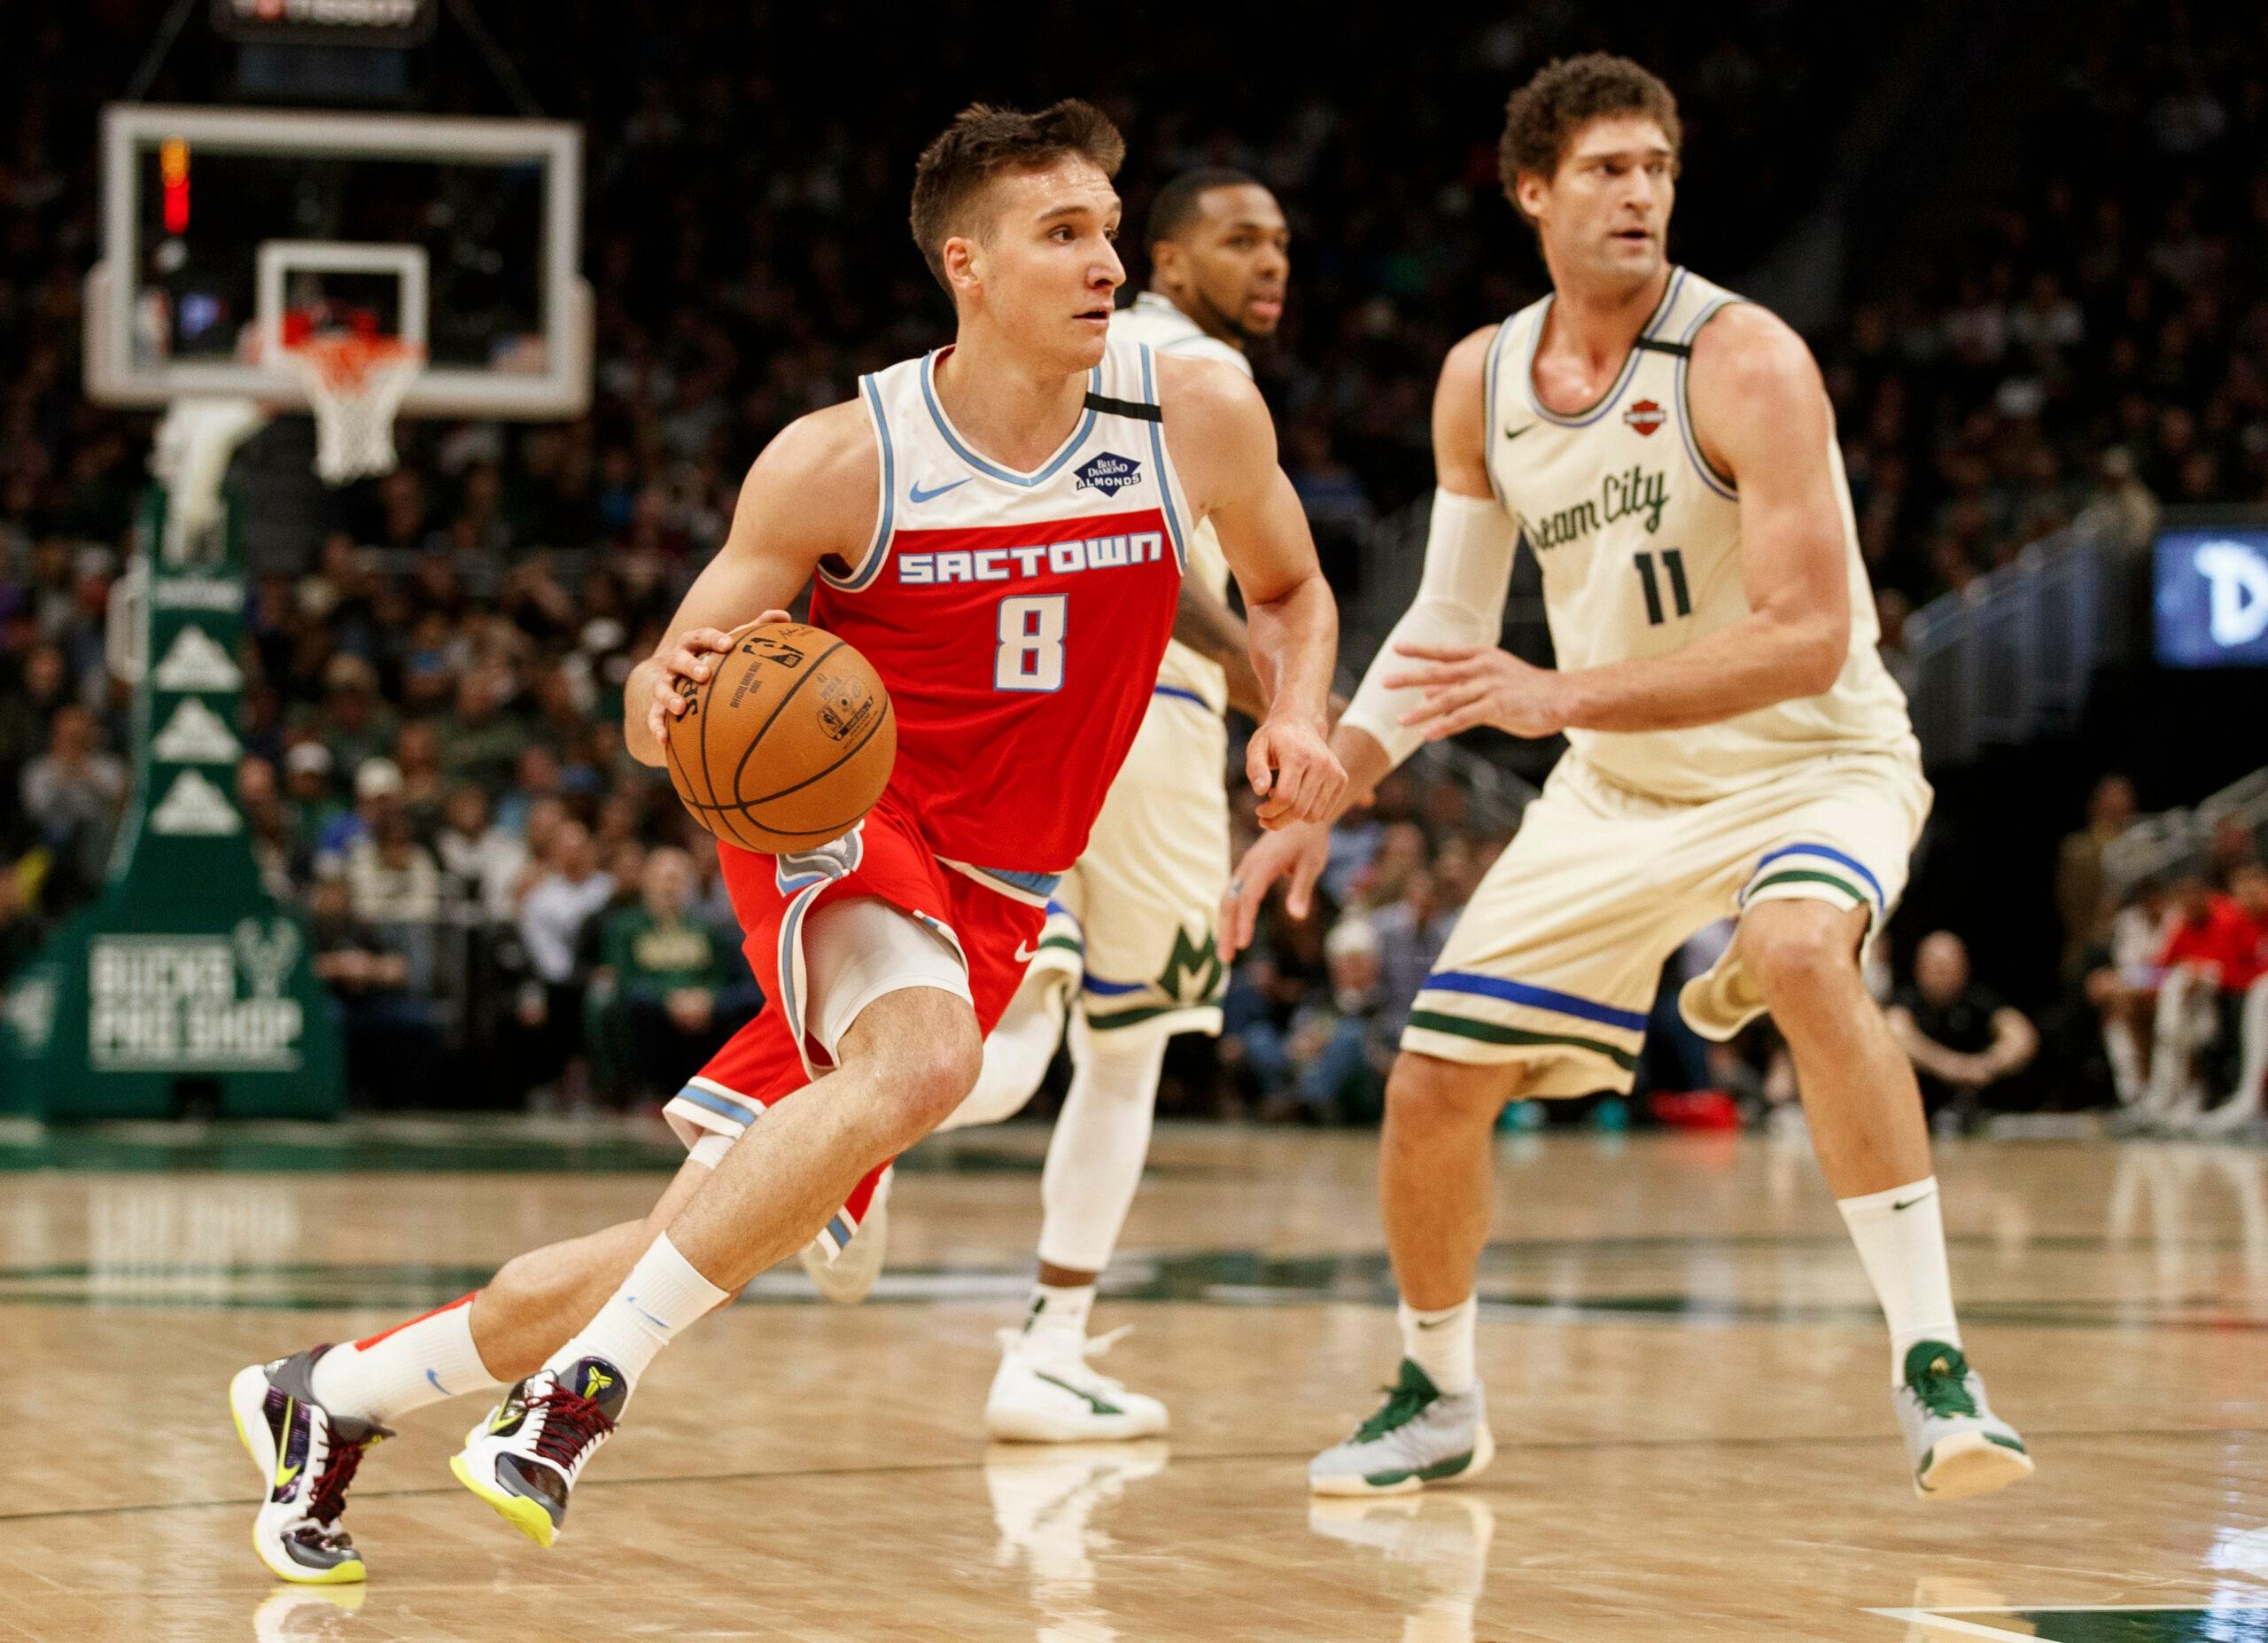 Report: Bogdan Bogdanovic headed to Bucks in sign-and-trade